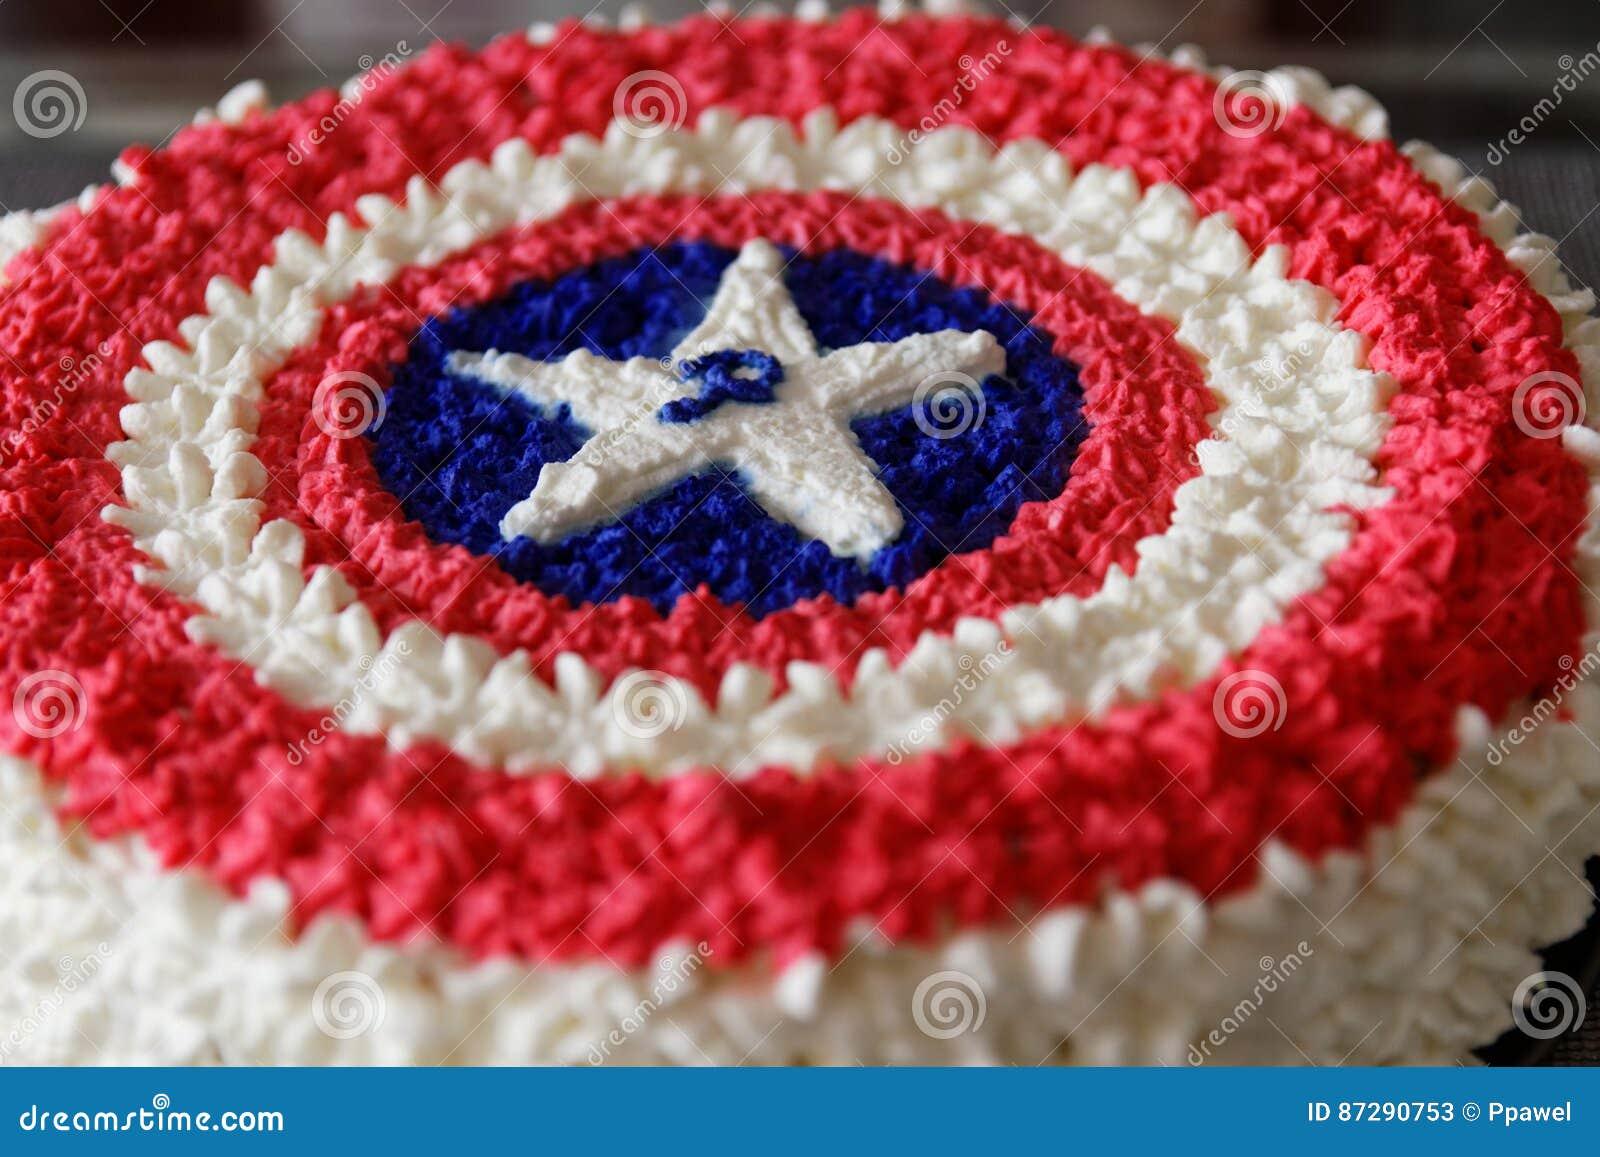 Captain America Editorial Stock Photo Image Of Blue 87290753